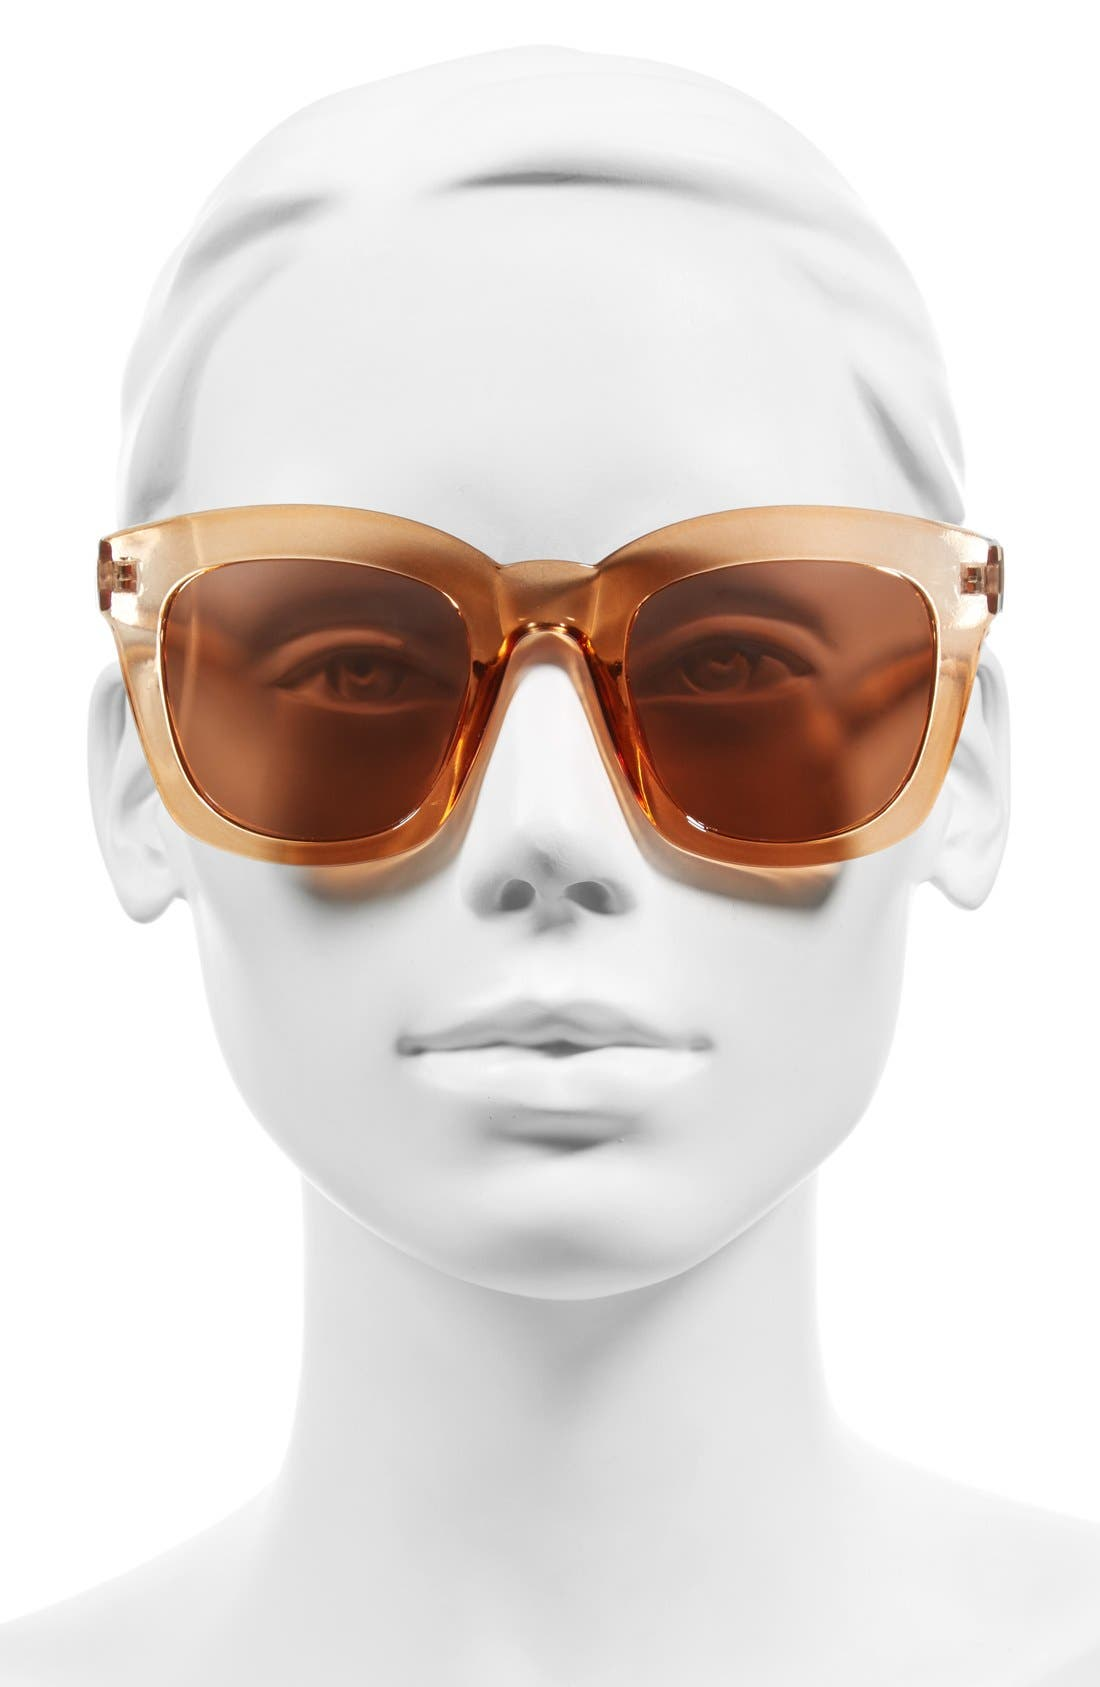 50mm Mirror Square Sunglasses,                             Alternate thumbnail 2, color,                             715